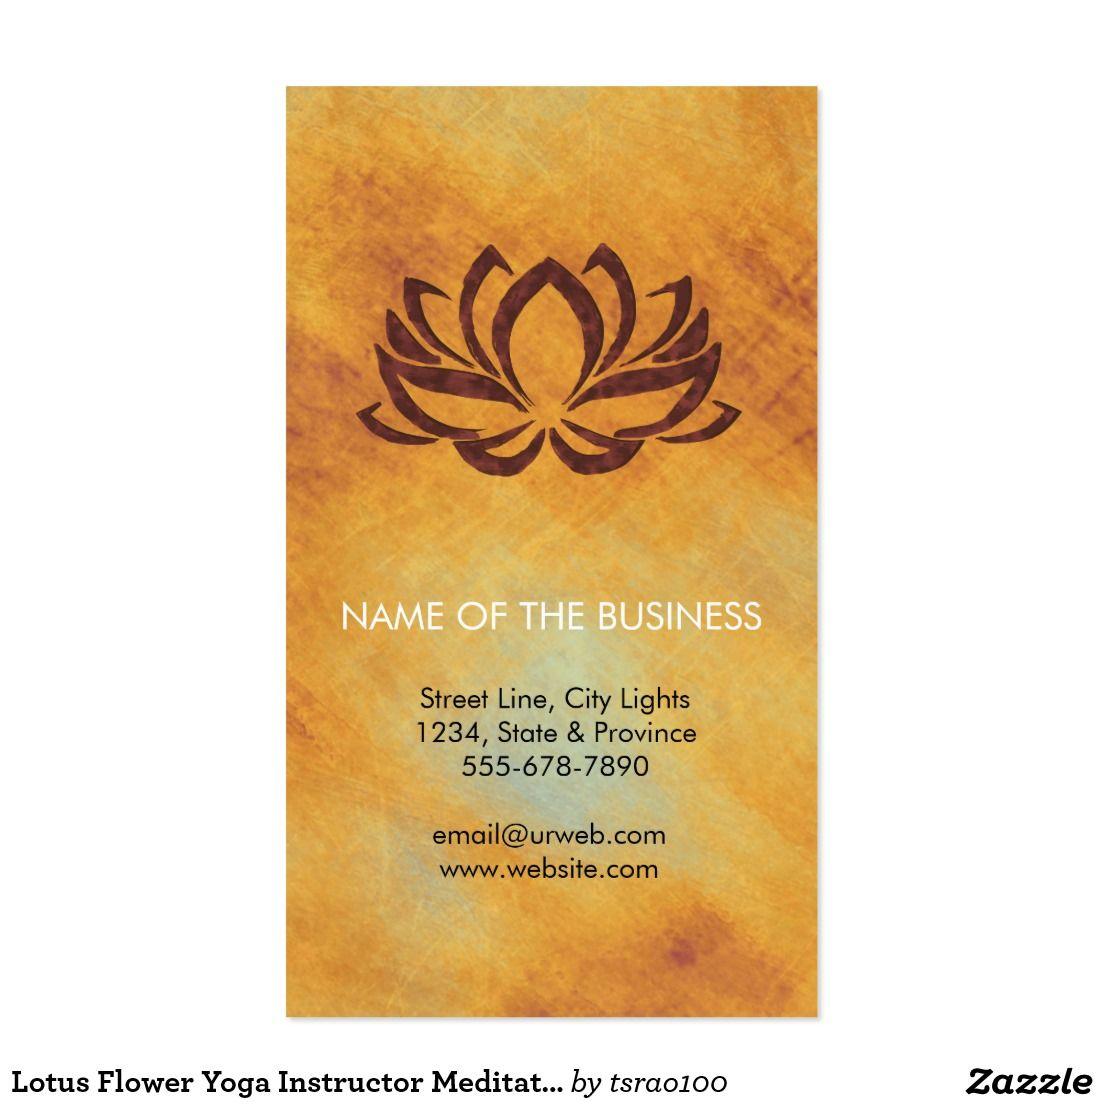 Lotus Flower Yoga Instructor Meditation Holistic Business Card ...